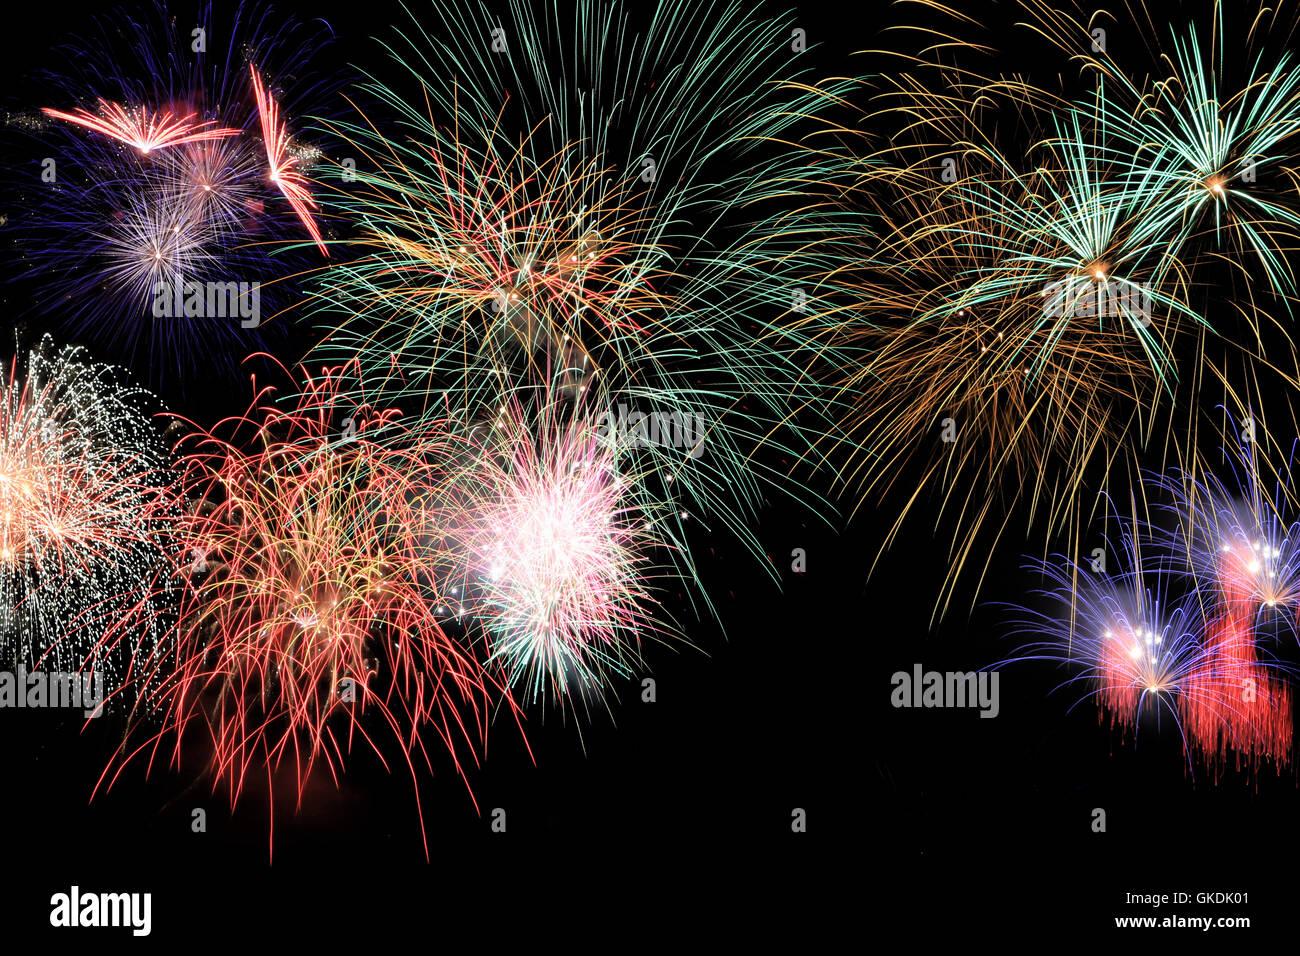 fireworks scene - Stock Image